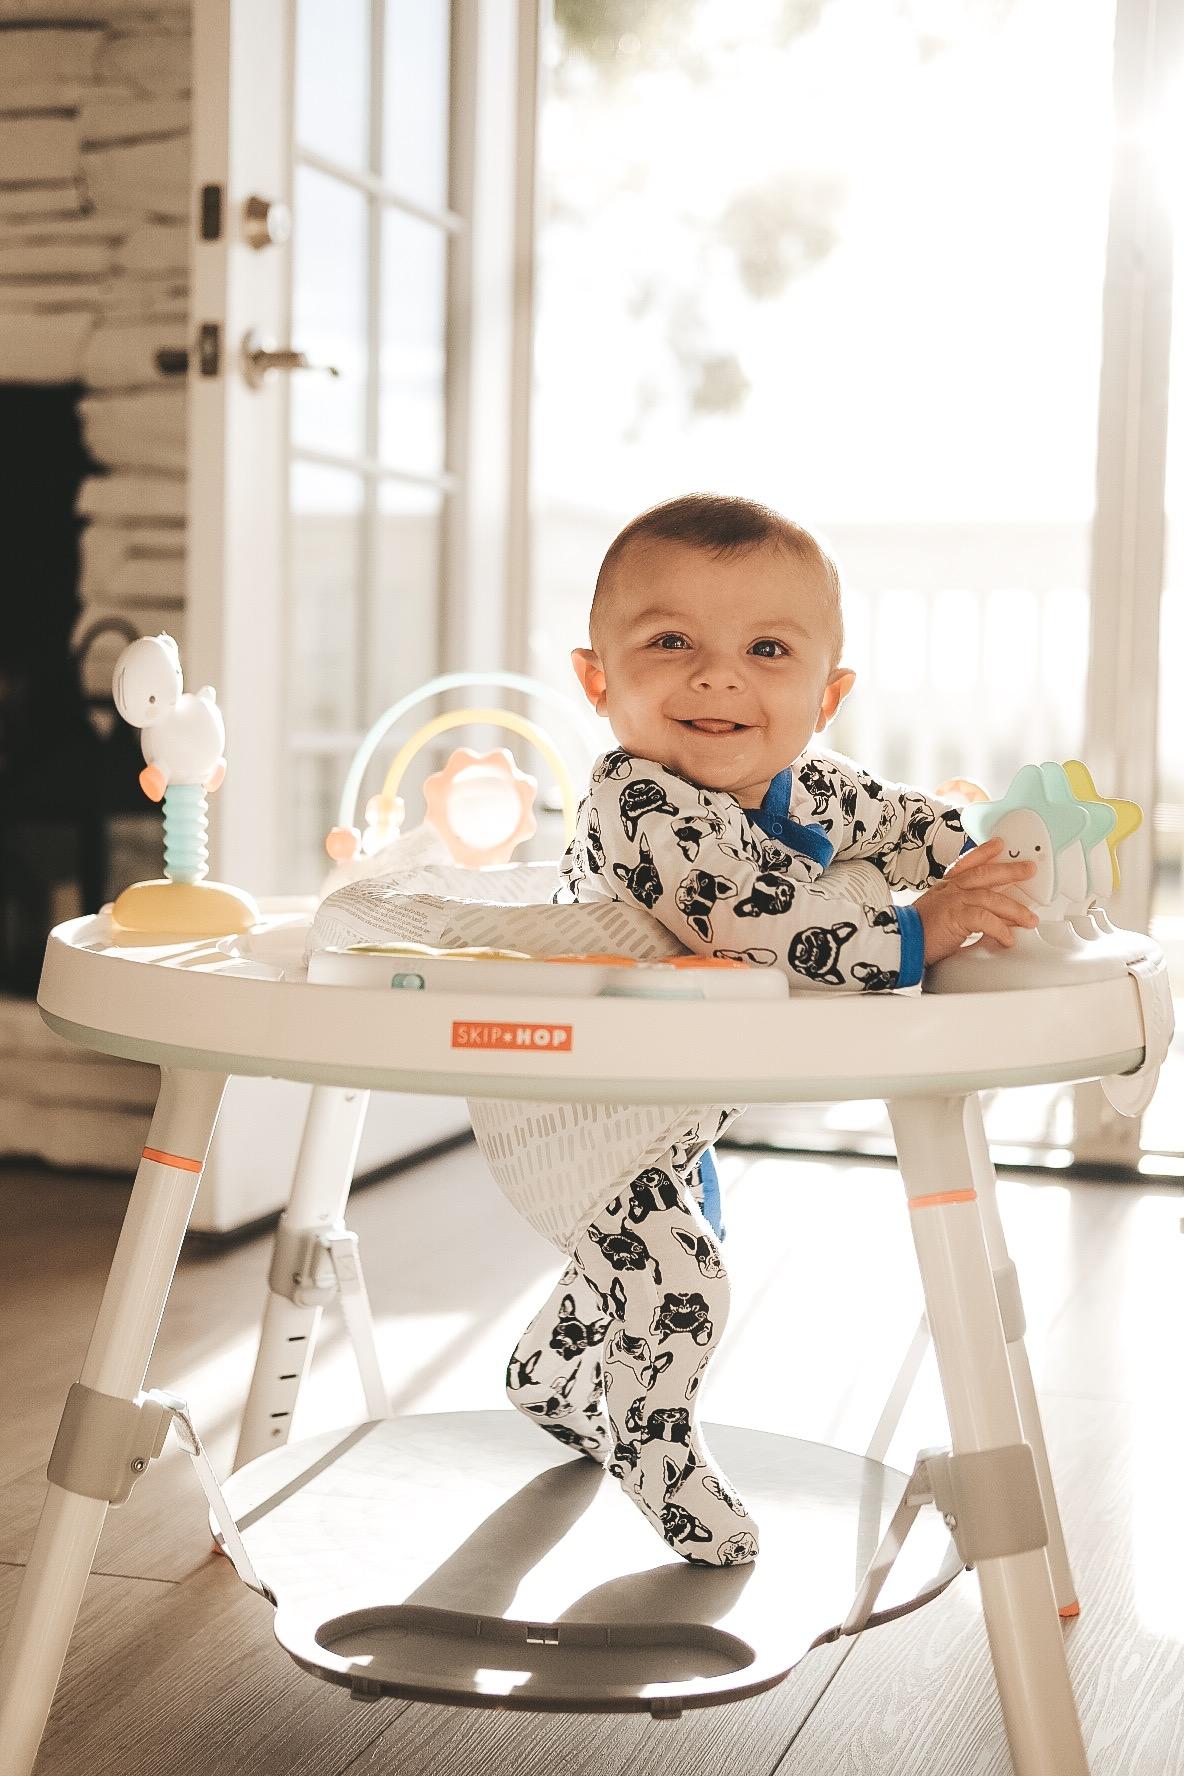 Newborn frenchie pajamas from Nordstrom Rack.  Skip Hop activity center.  White baby toys.